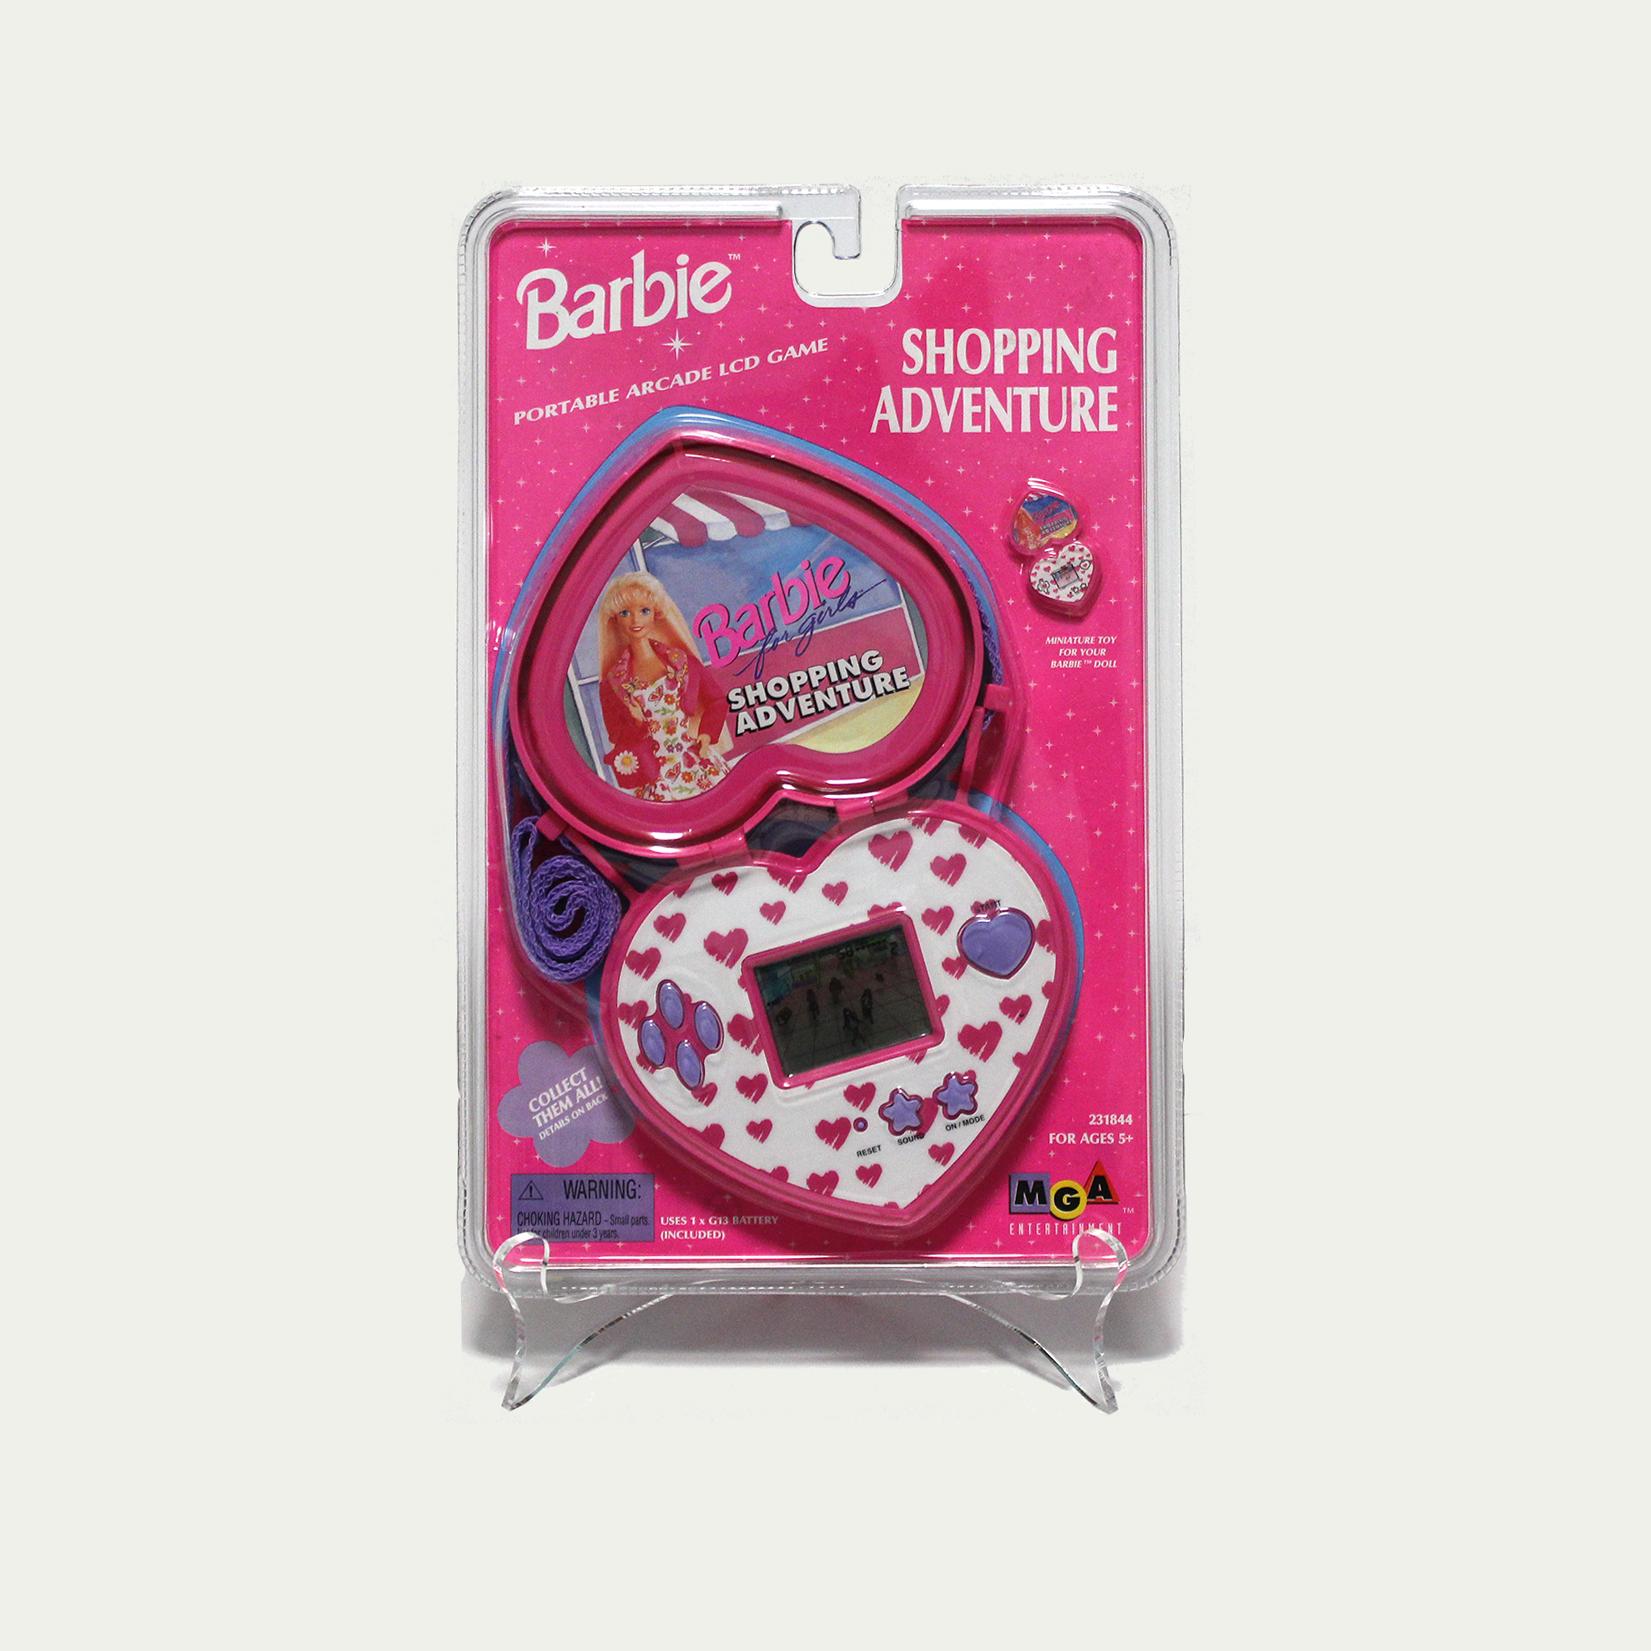 Barbie for Girls Shopping Adventure